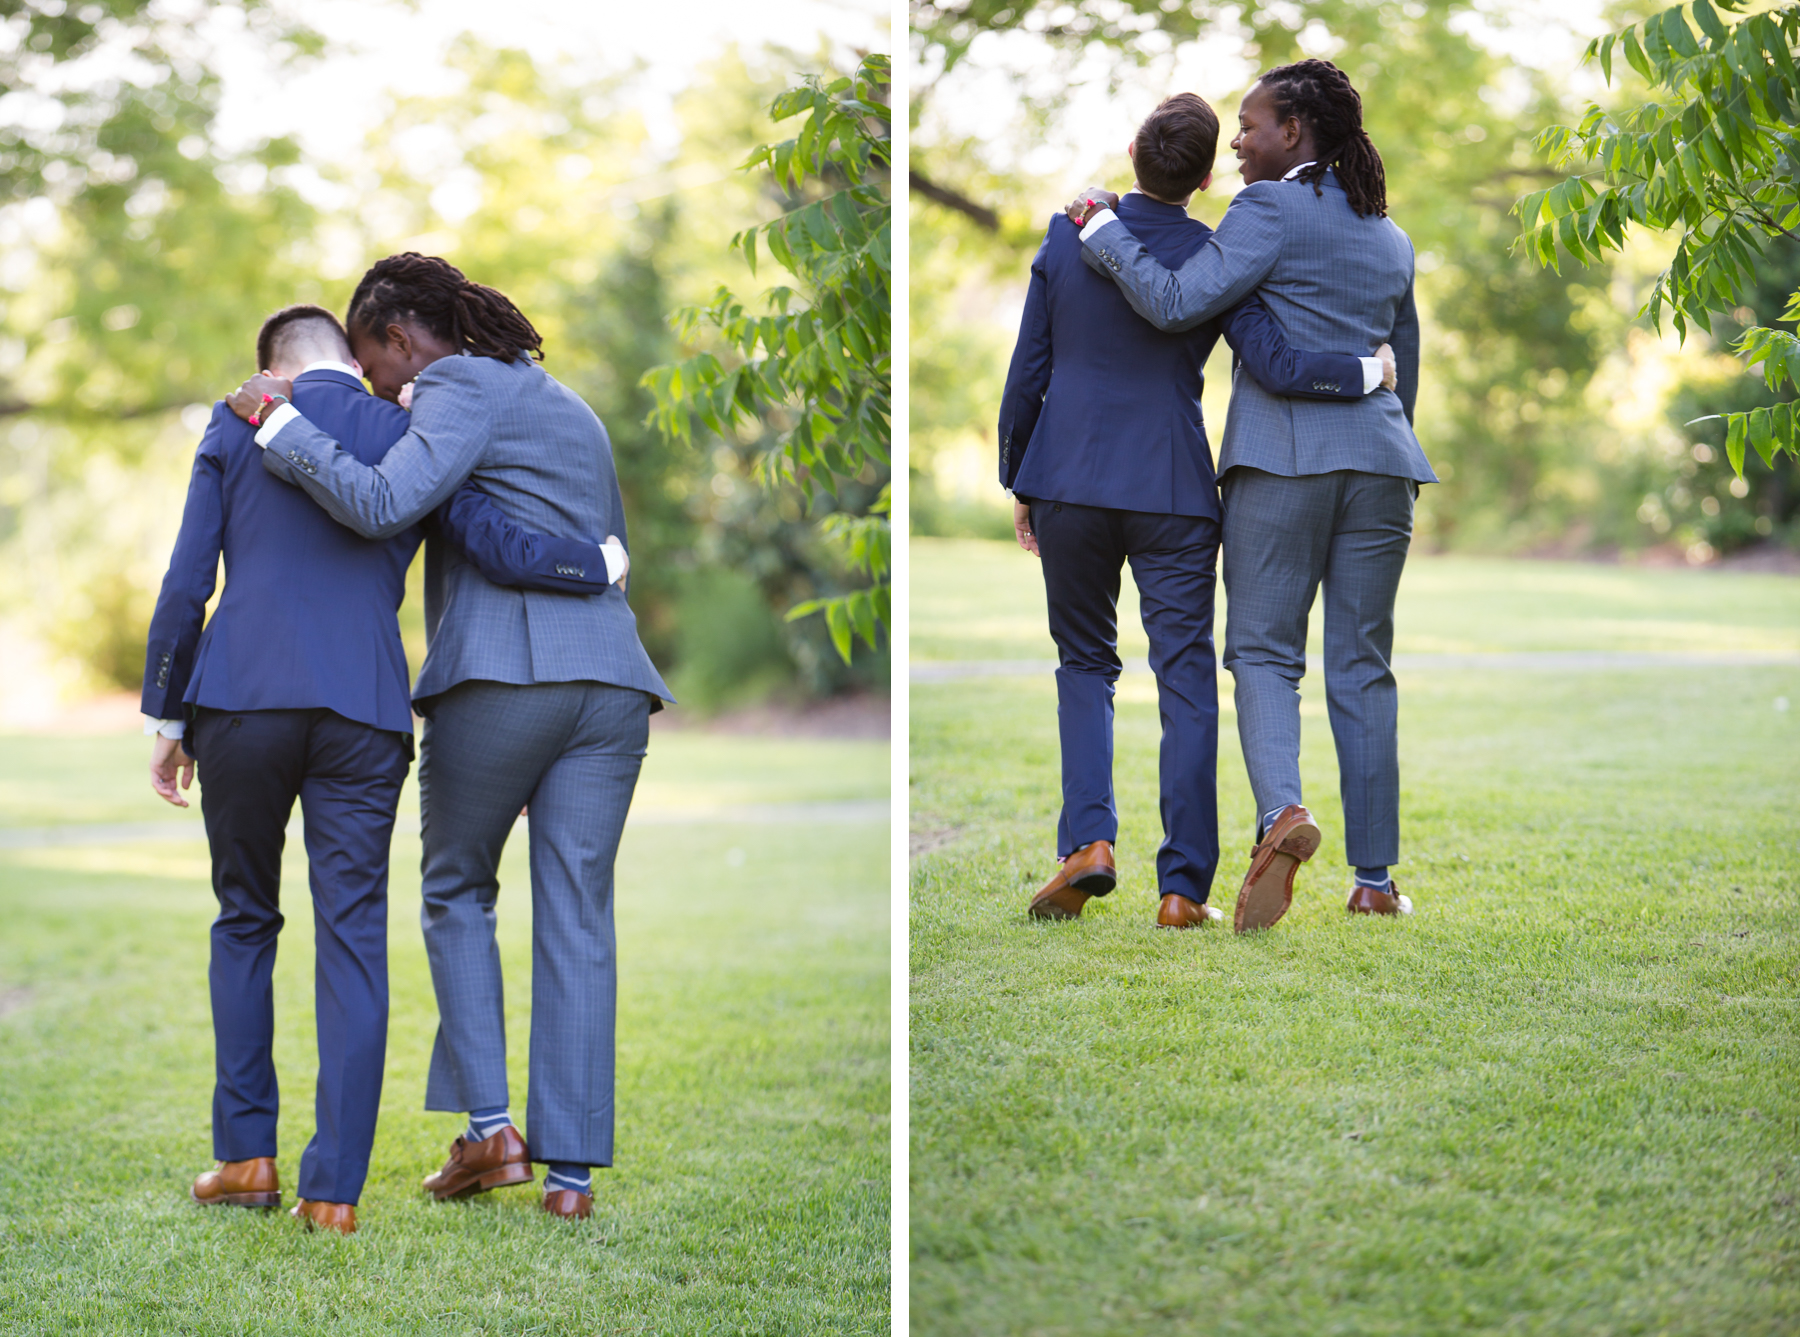 brides-in-suits.jpg